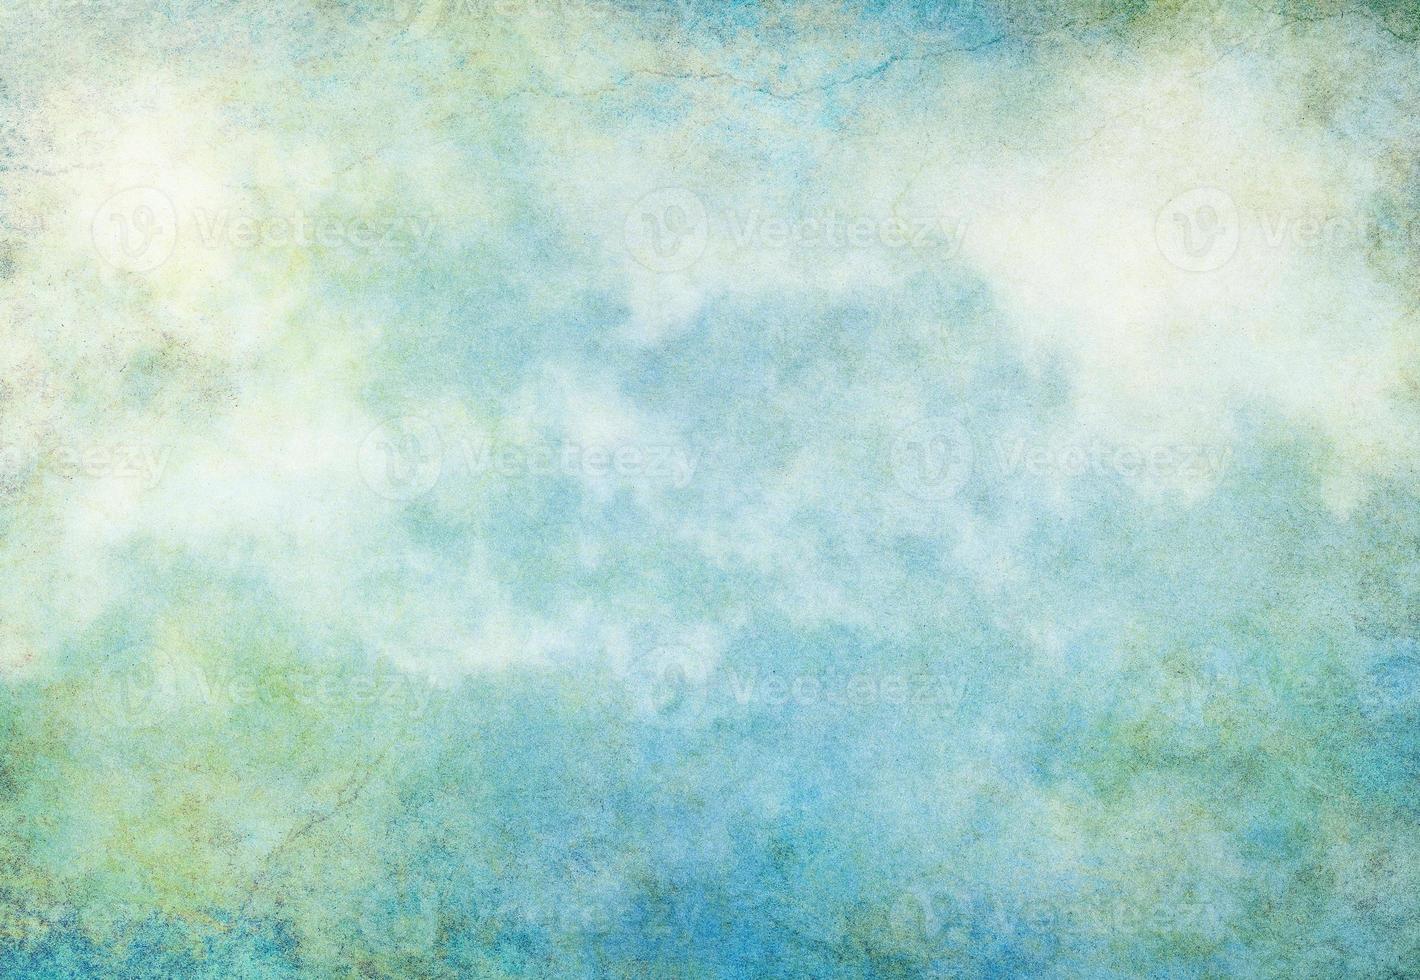 Cloud Grunge Earth photo